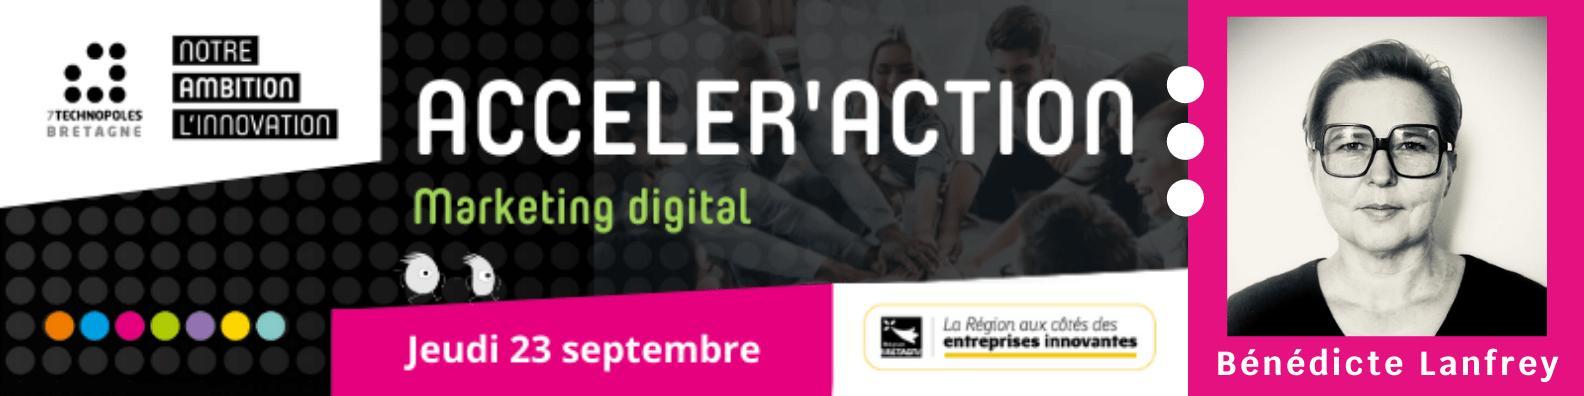 Acceleraction Marketing Digital 2021